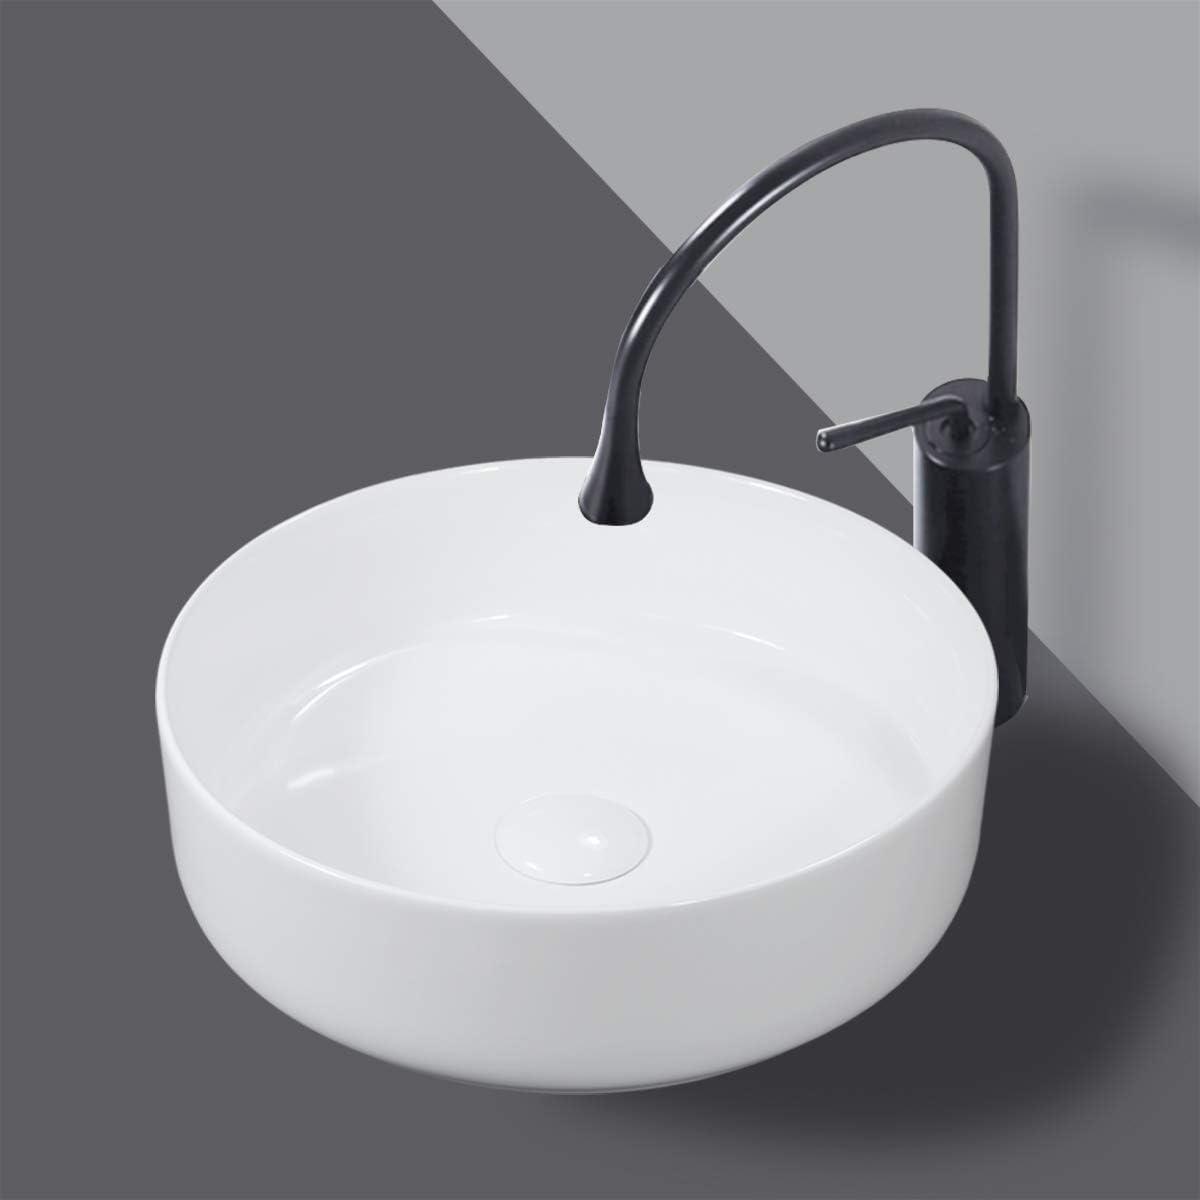 Winzo Small Round Bathroom Vessel Sink Thin Modern Design Cabinet Vanity Top Basin Ceramic White Wz6176 Amazon Com